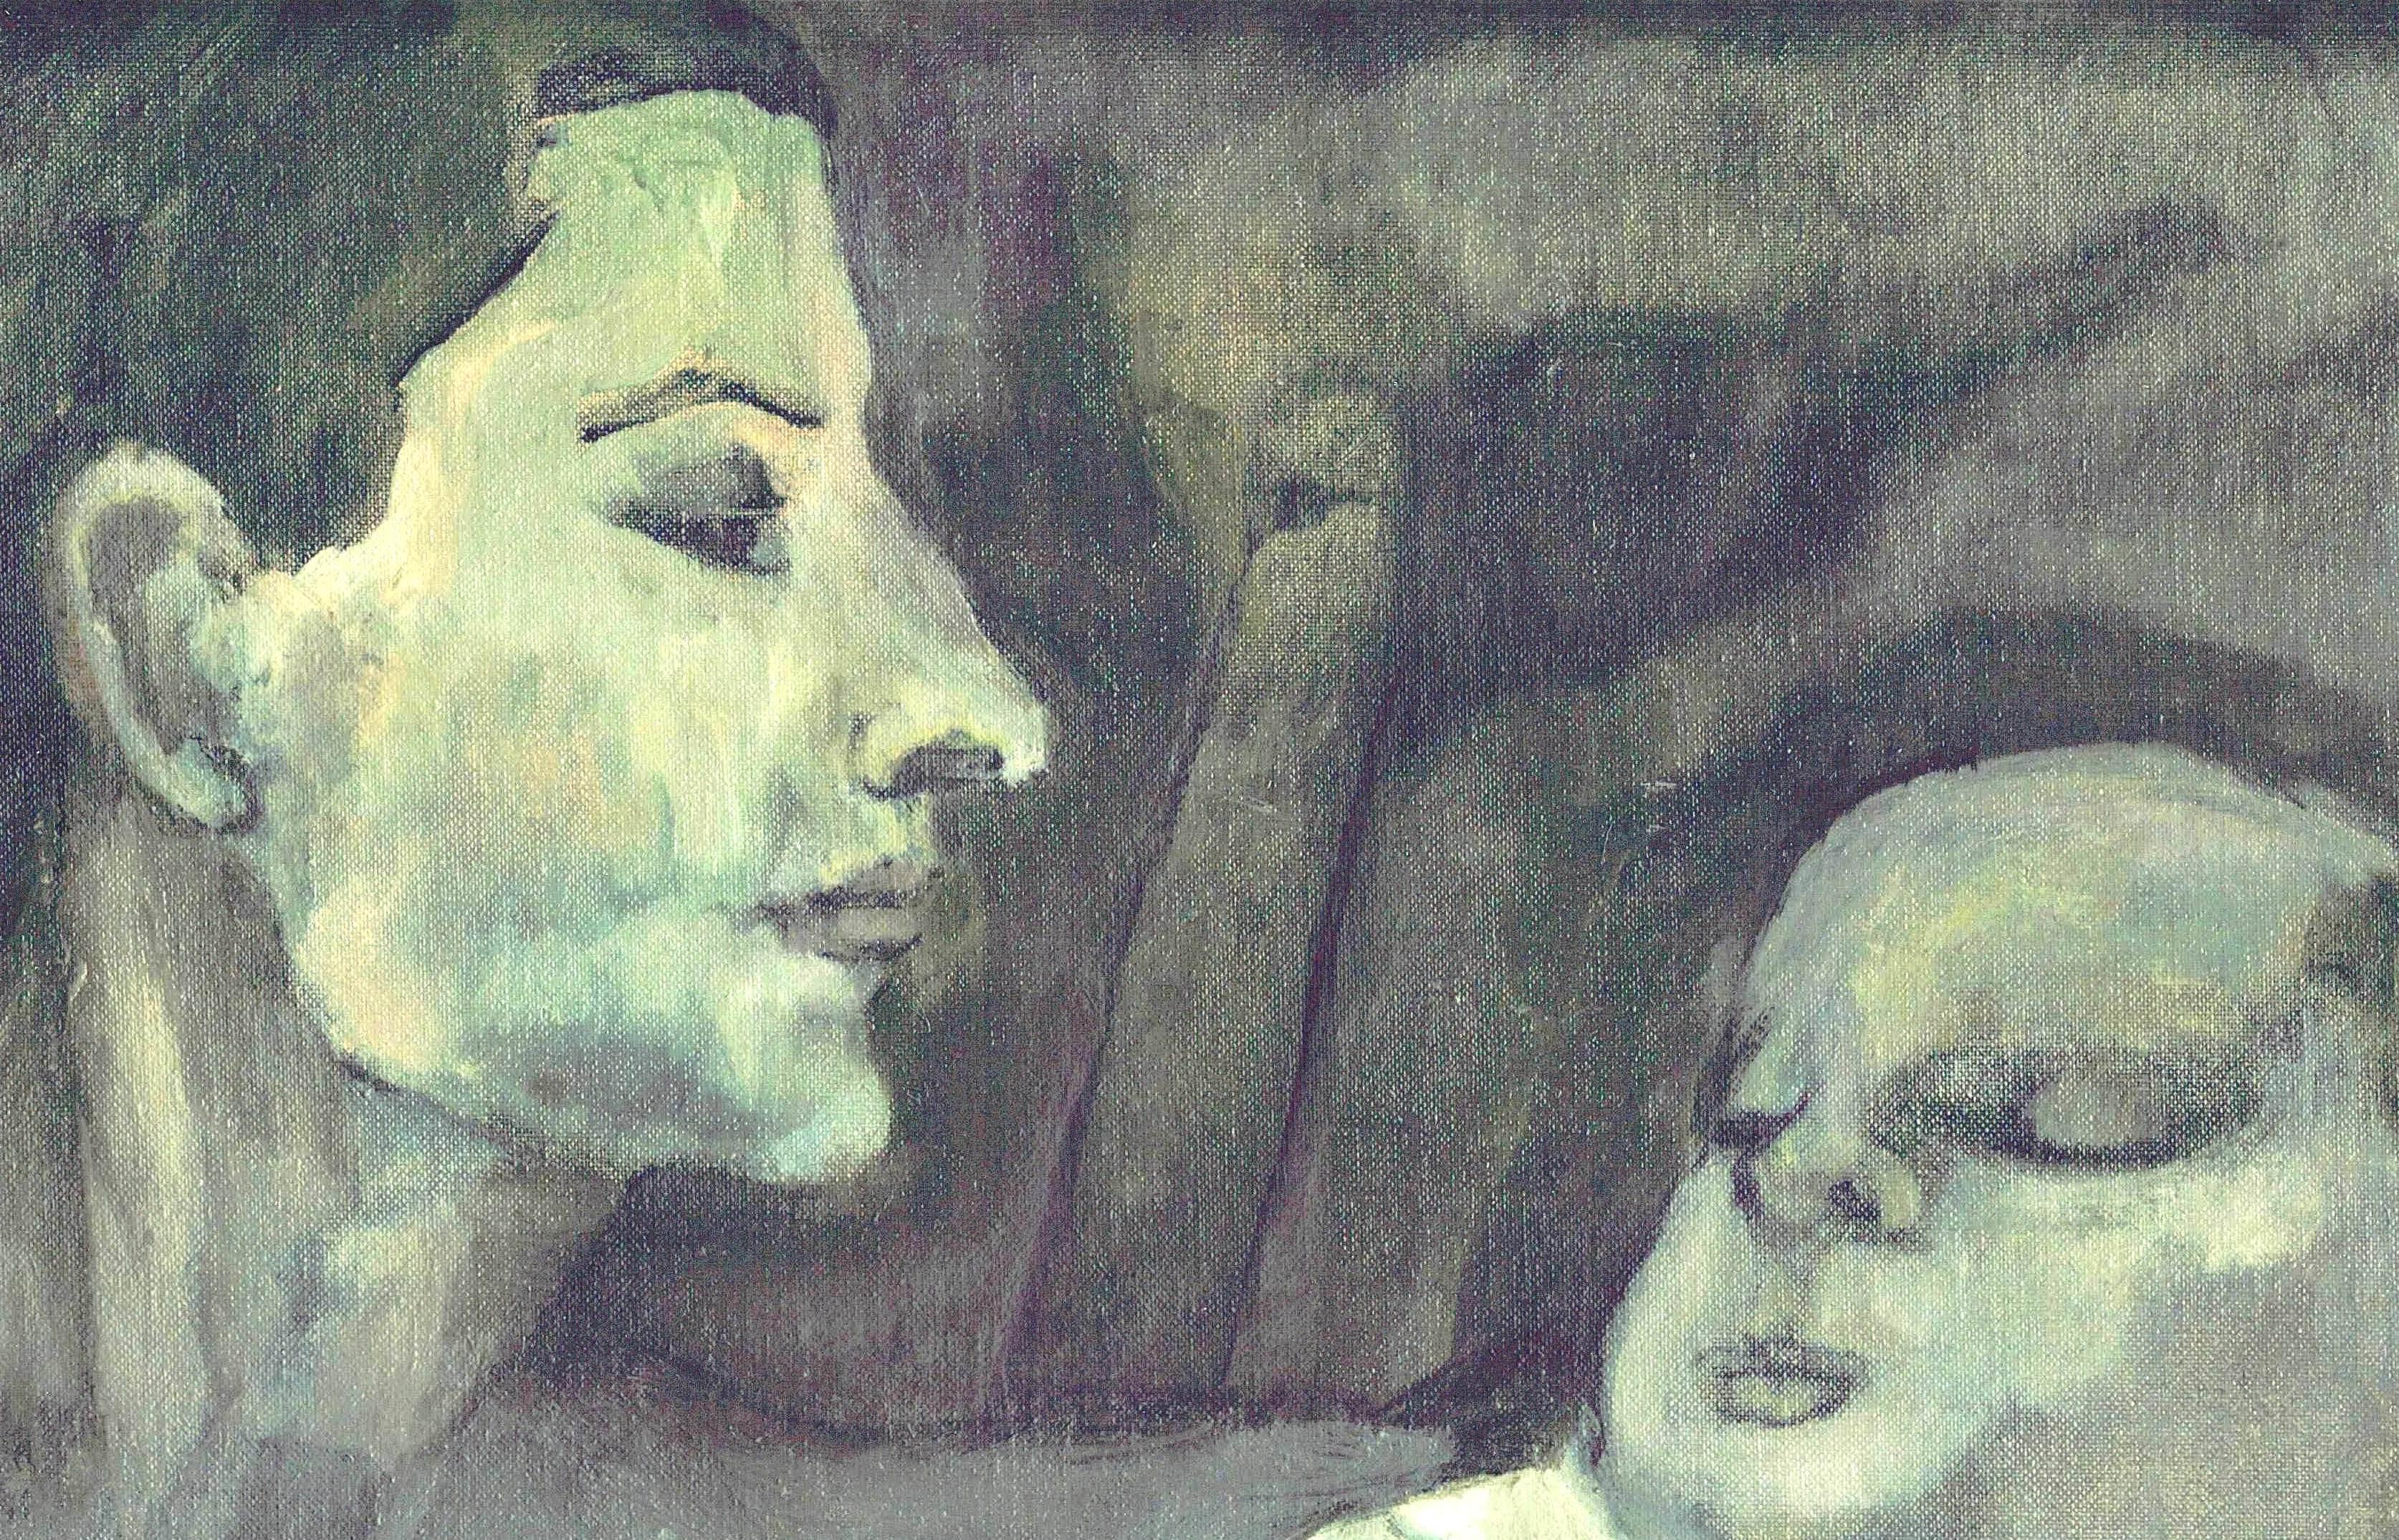 Sigrid Lochner, Nap Time, oil on panel, 1970, 10x12.5cm